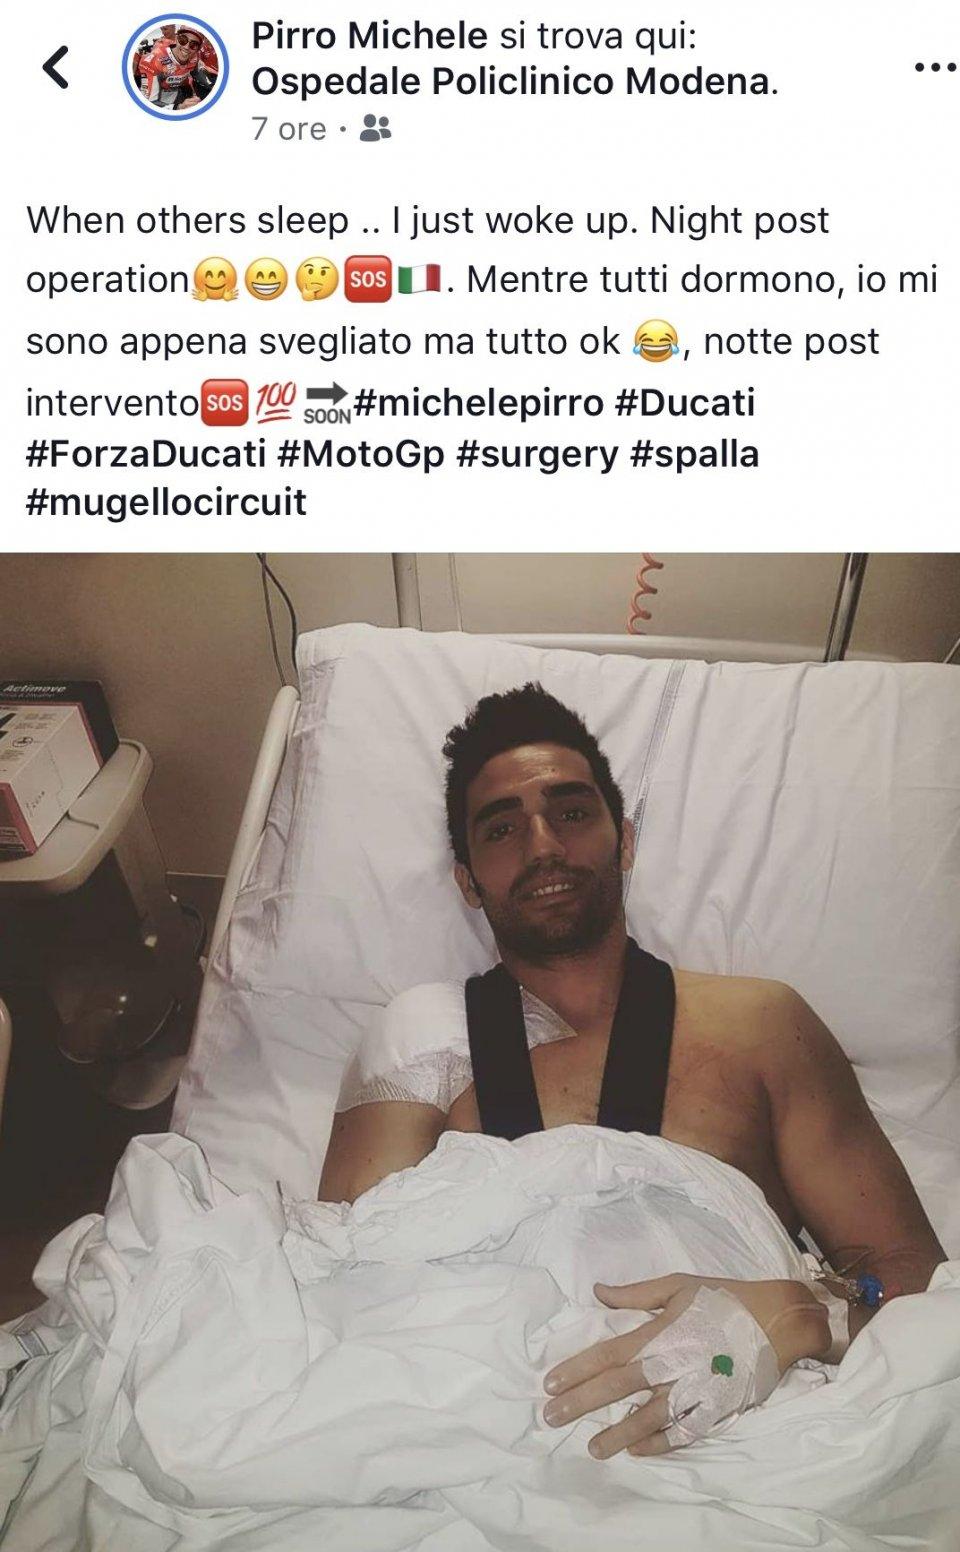 MotoGP: Michele Pirro undergoes shoulder surgery: all OK